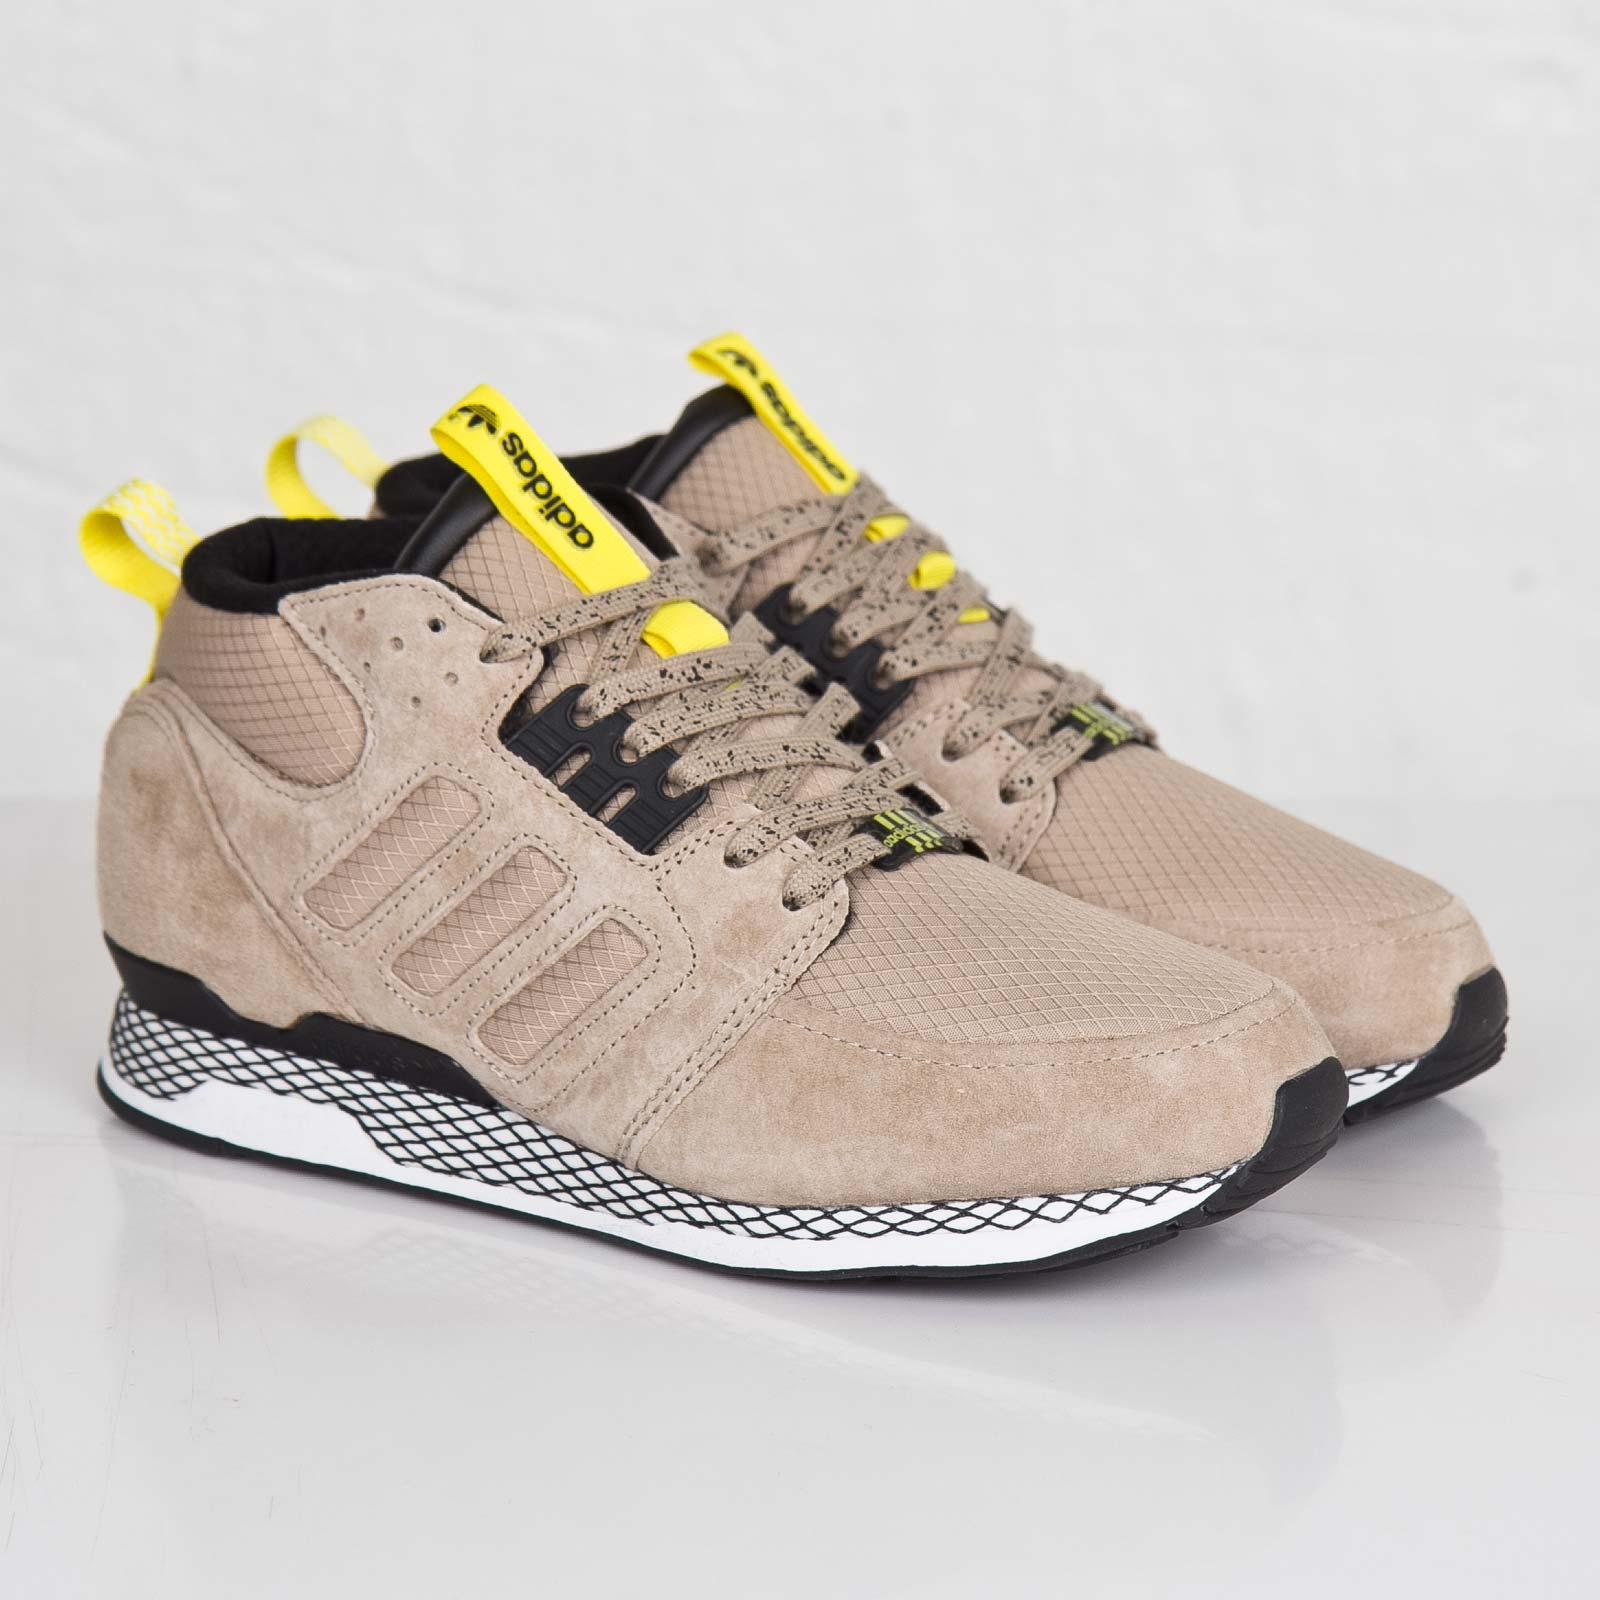 adidas ZX Casual Mid - M20636 - SNS | sneakers & streetwear online ...